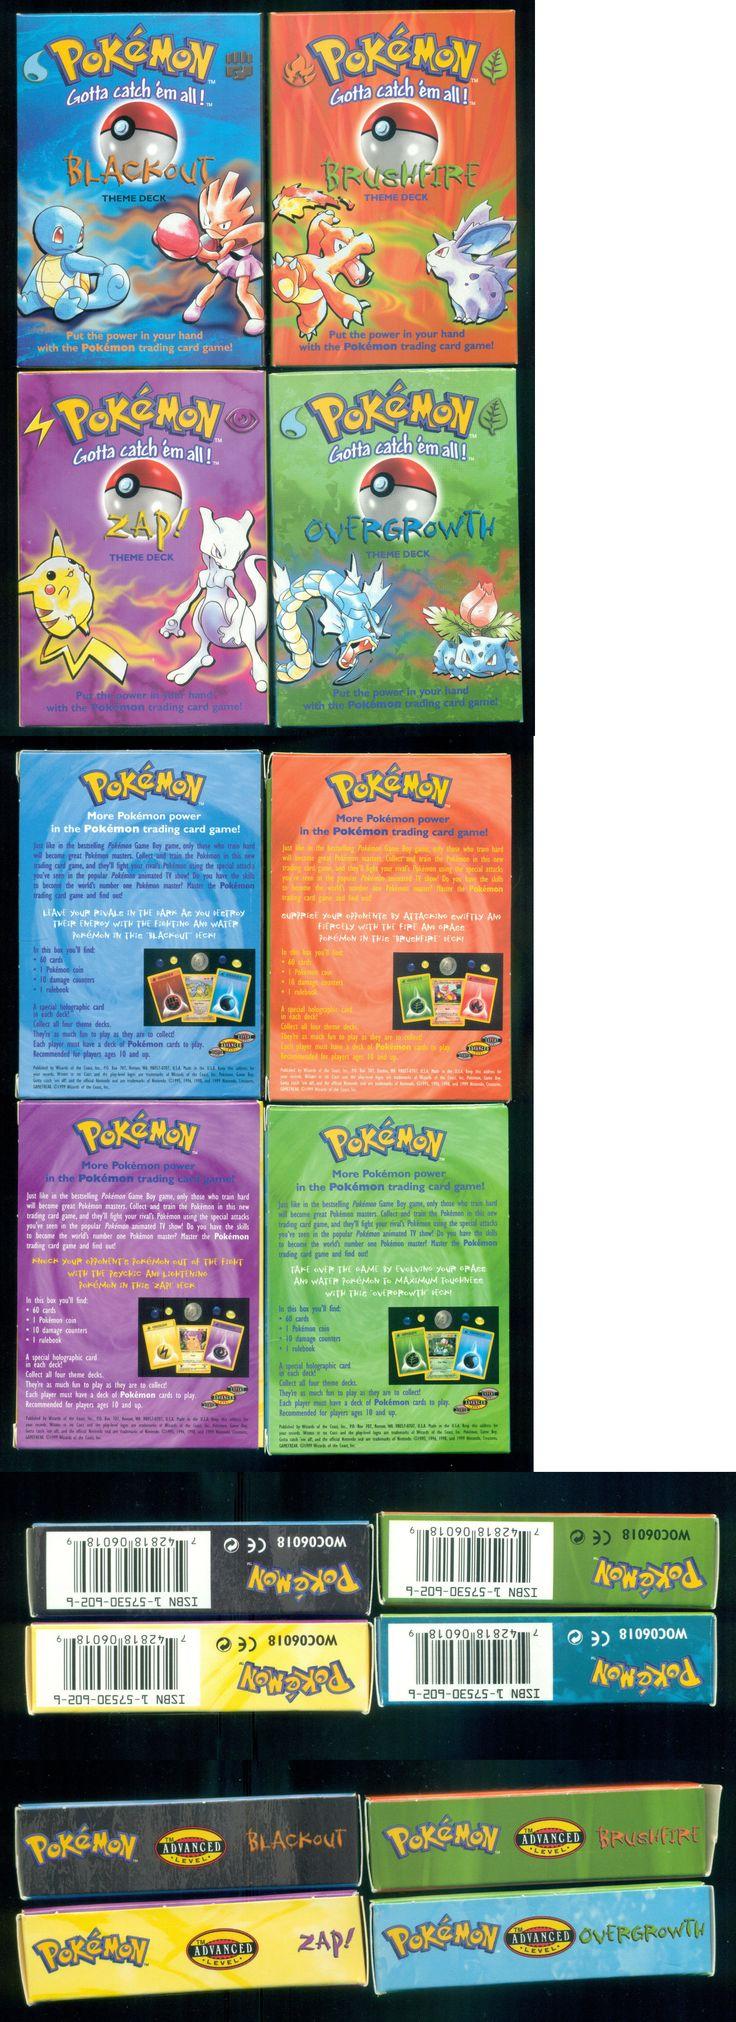 Pok mon Sealed Decks and Kits 183467: 1999 Pokemon Theme Deck Set - Zap-Brushfire-Overgrowth-Blackout Sealed Decks -> BUY IT NOW ONLY: $279.99 on eBay!